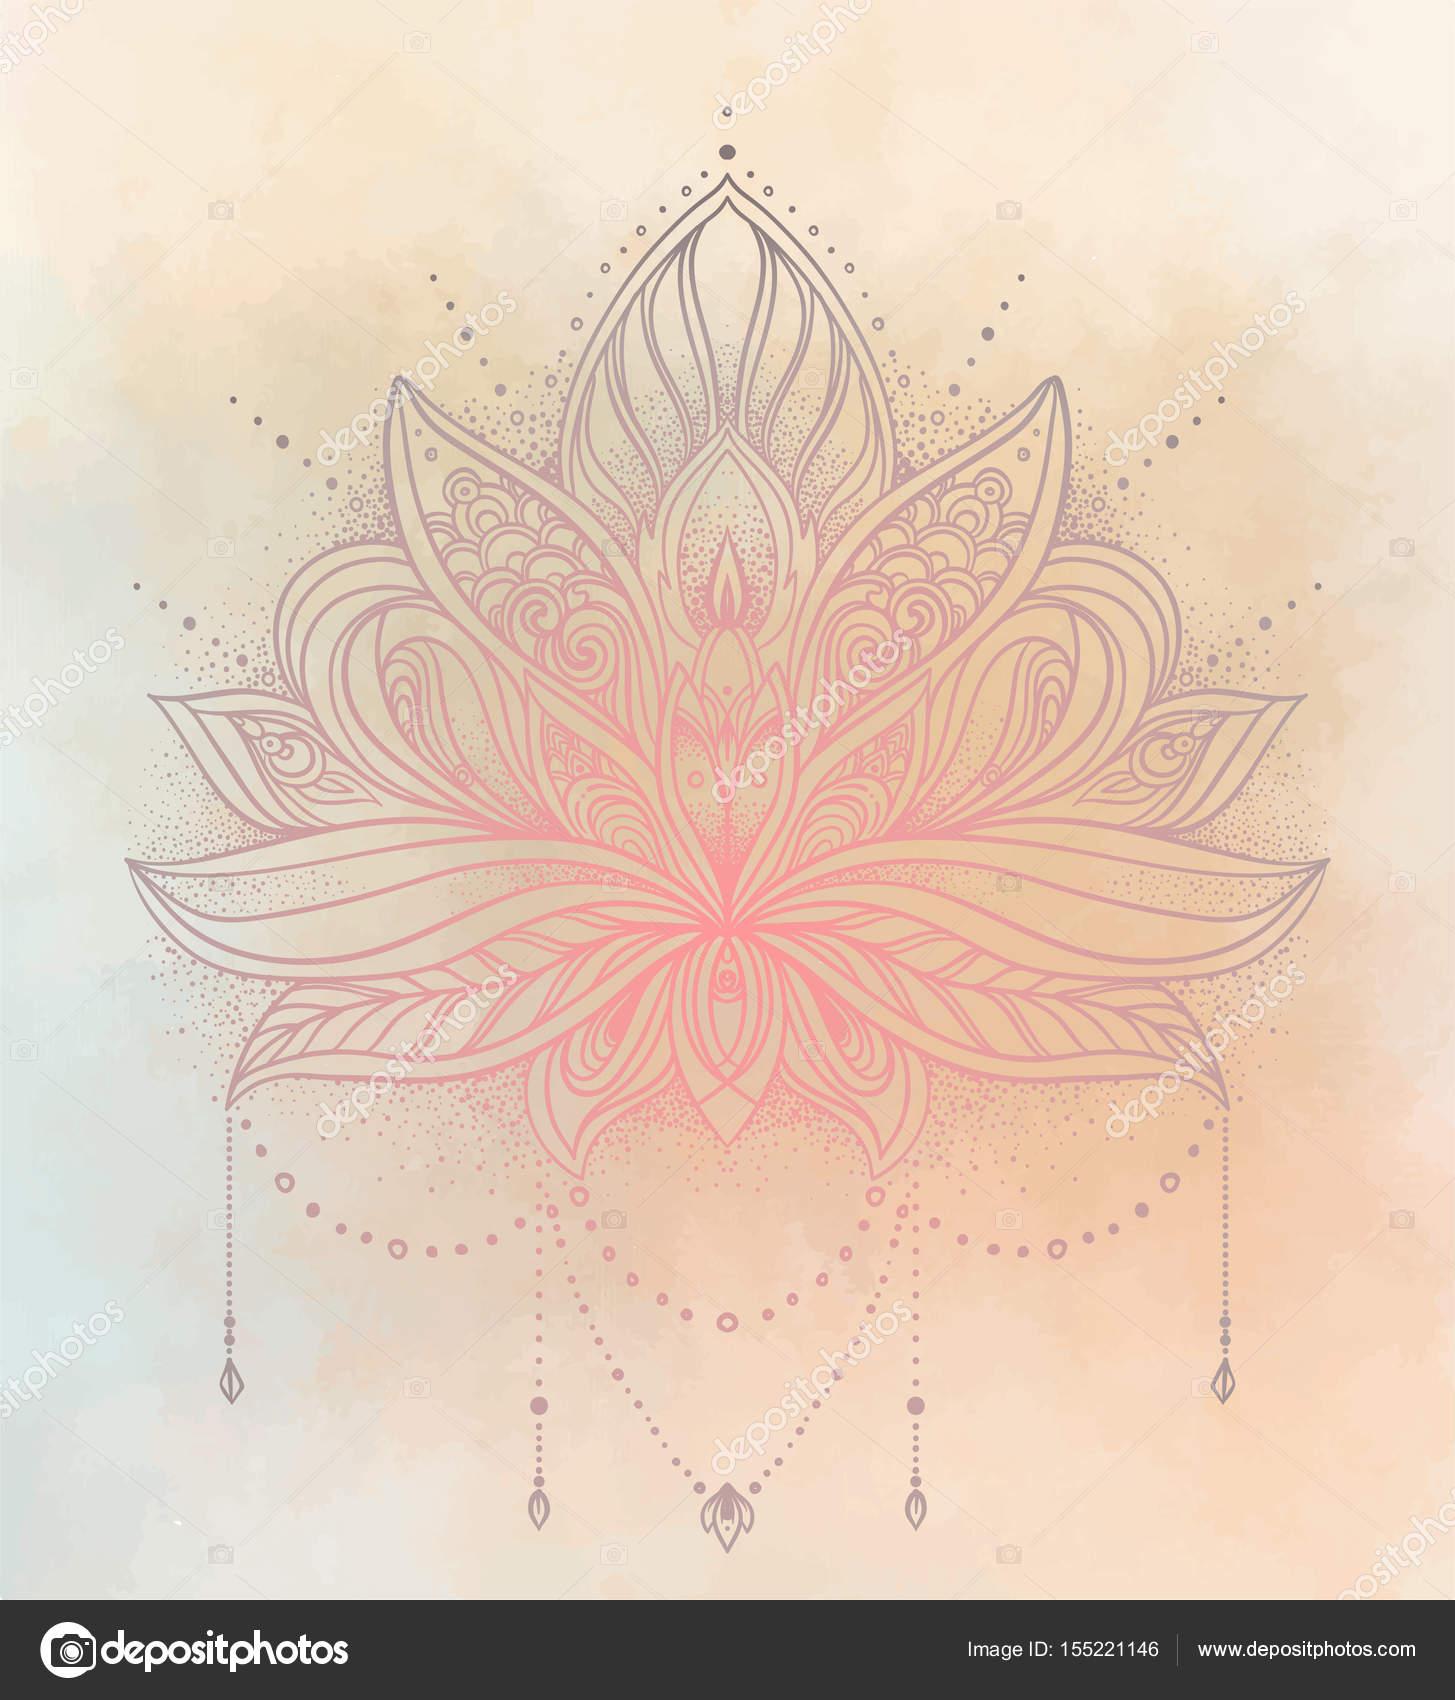 Vector Ornamental Lotus Flower Ethnic Art Patterned Indian Pai